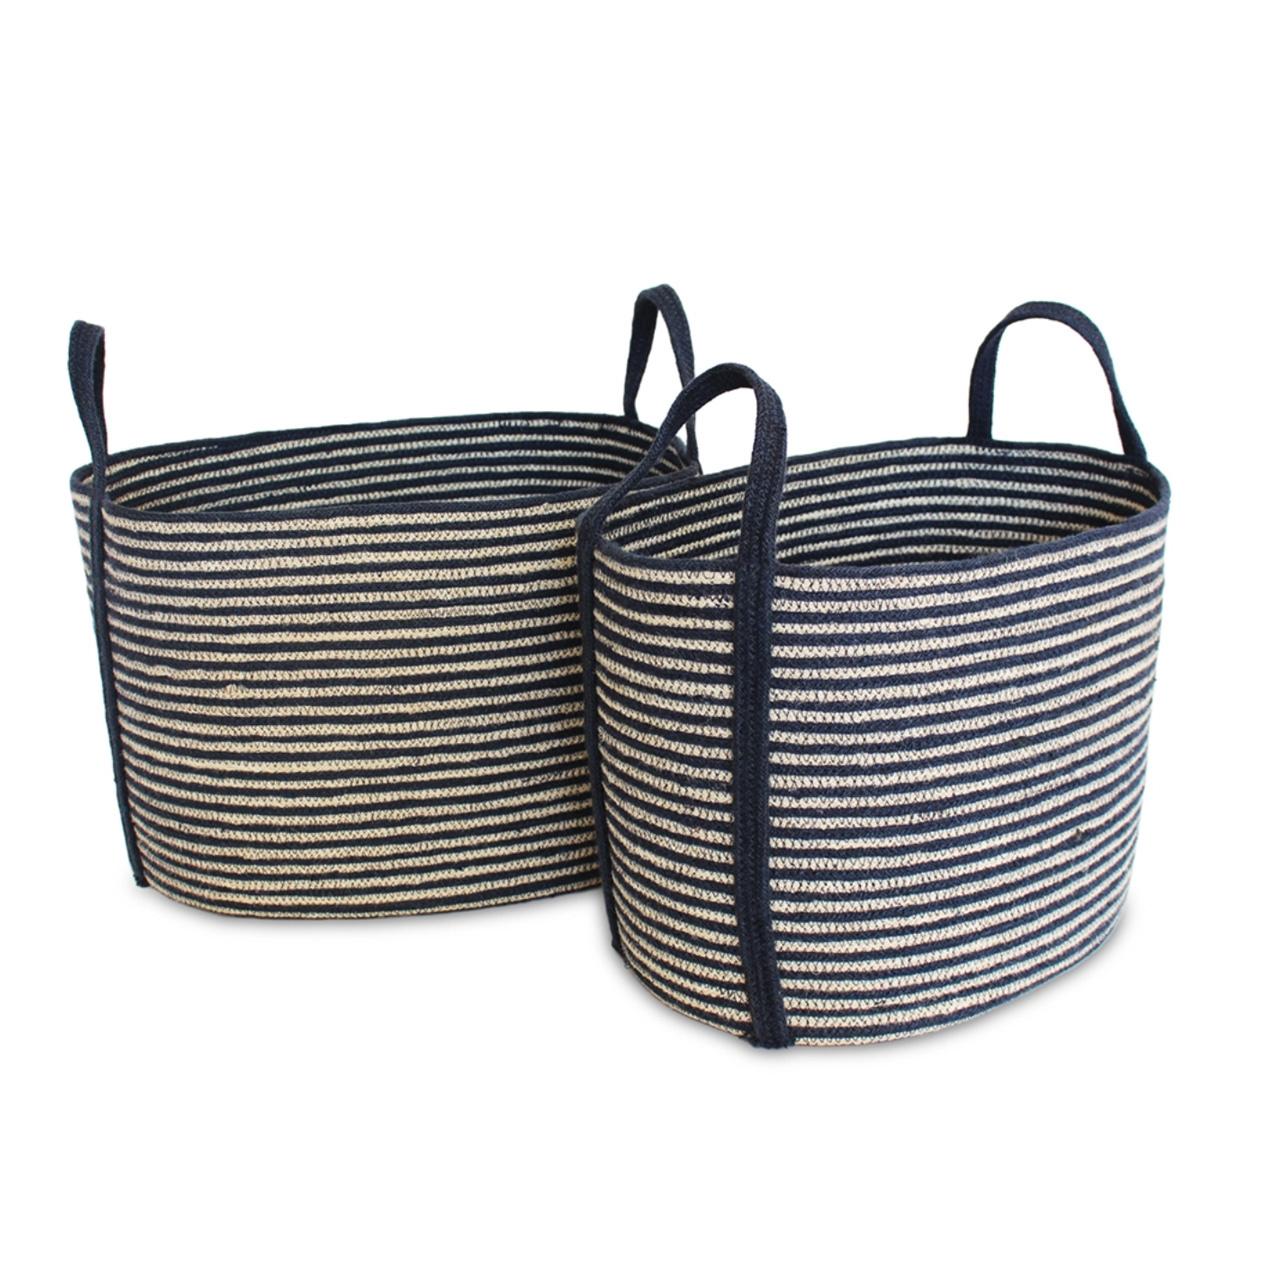 Jute Oval Tote Laundry Basket - Large-1